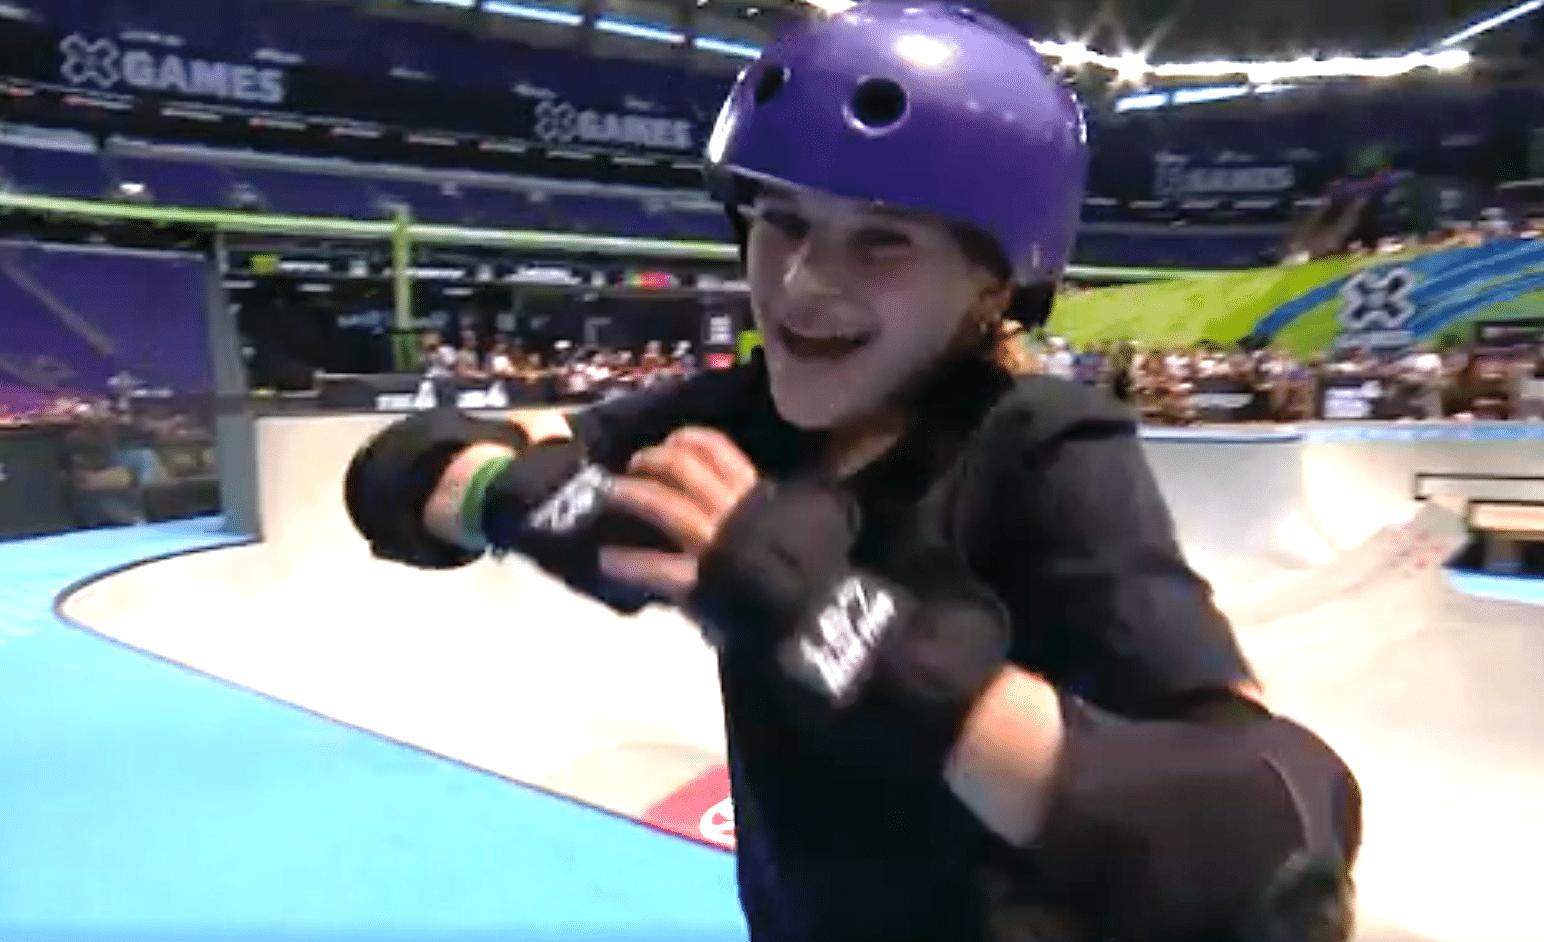 Thirteen Year Old Surf Skate Virtuoso Sabre Norris Wins X